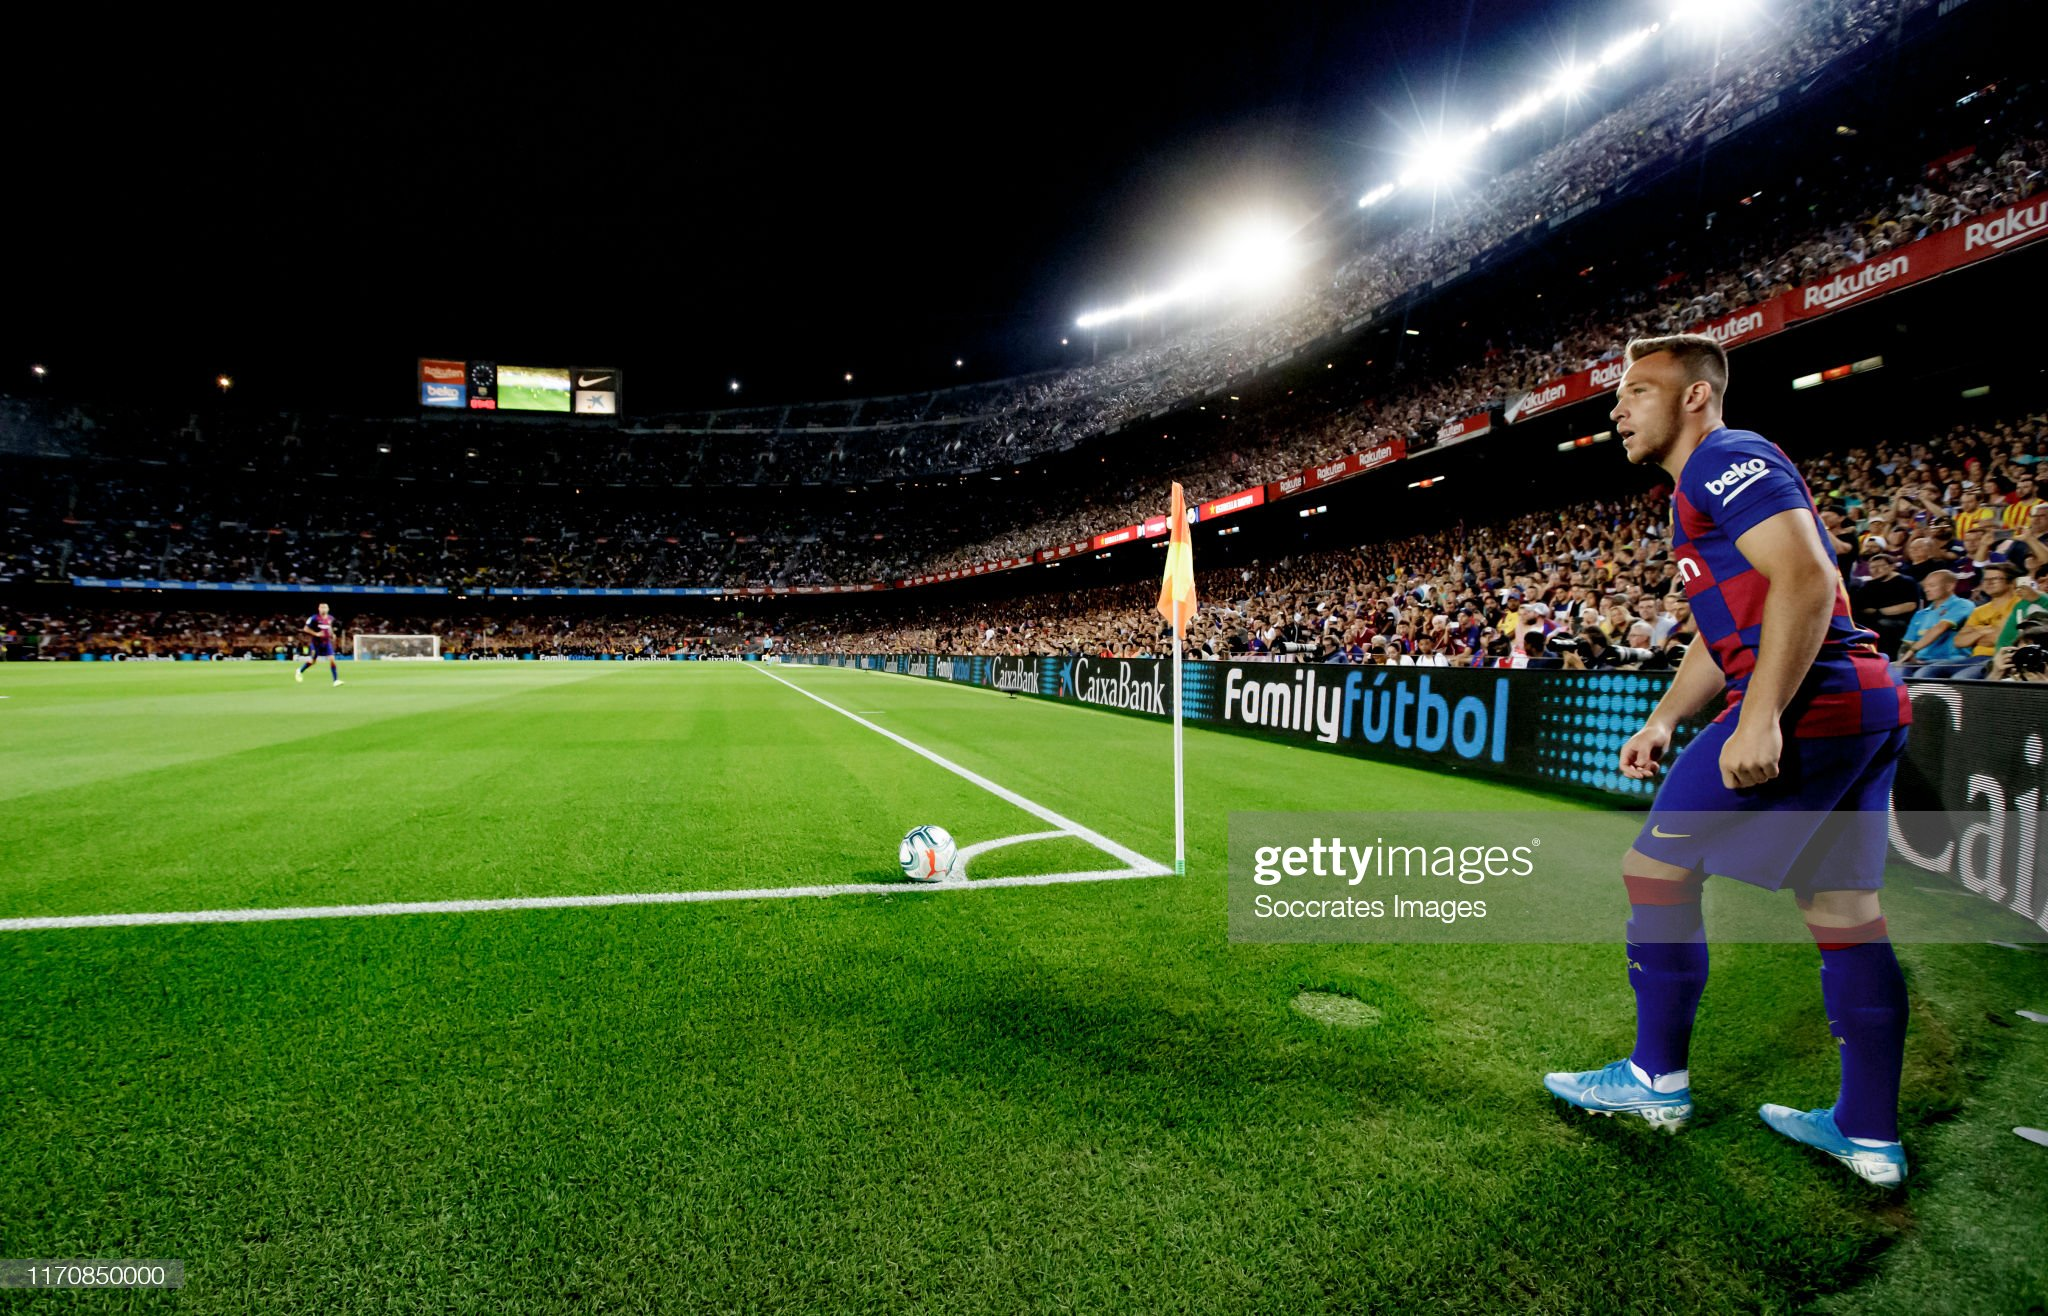 صور مباراة : برشلونة - فياريال 2-1 ( 24-09-2019 )  Arthur-of-fc-barcelona-during-the-la-liga-santander-match-between-fc-picture-id1170850000?s=2048x2048